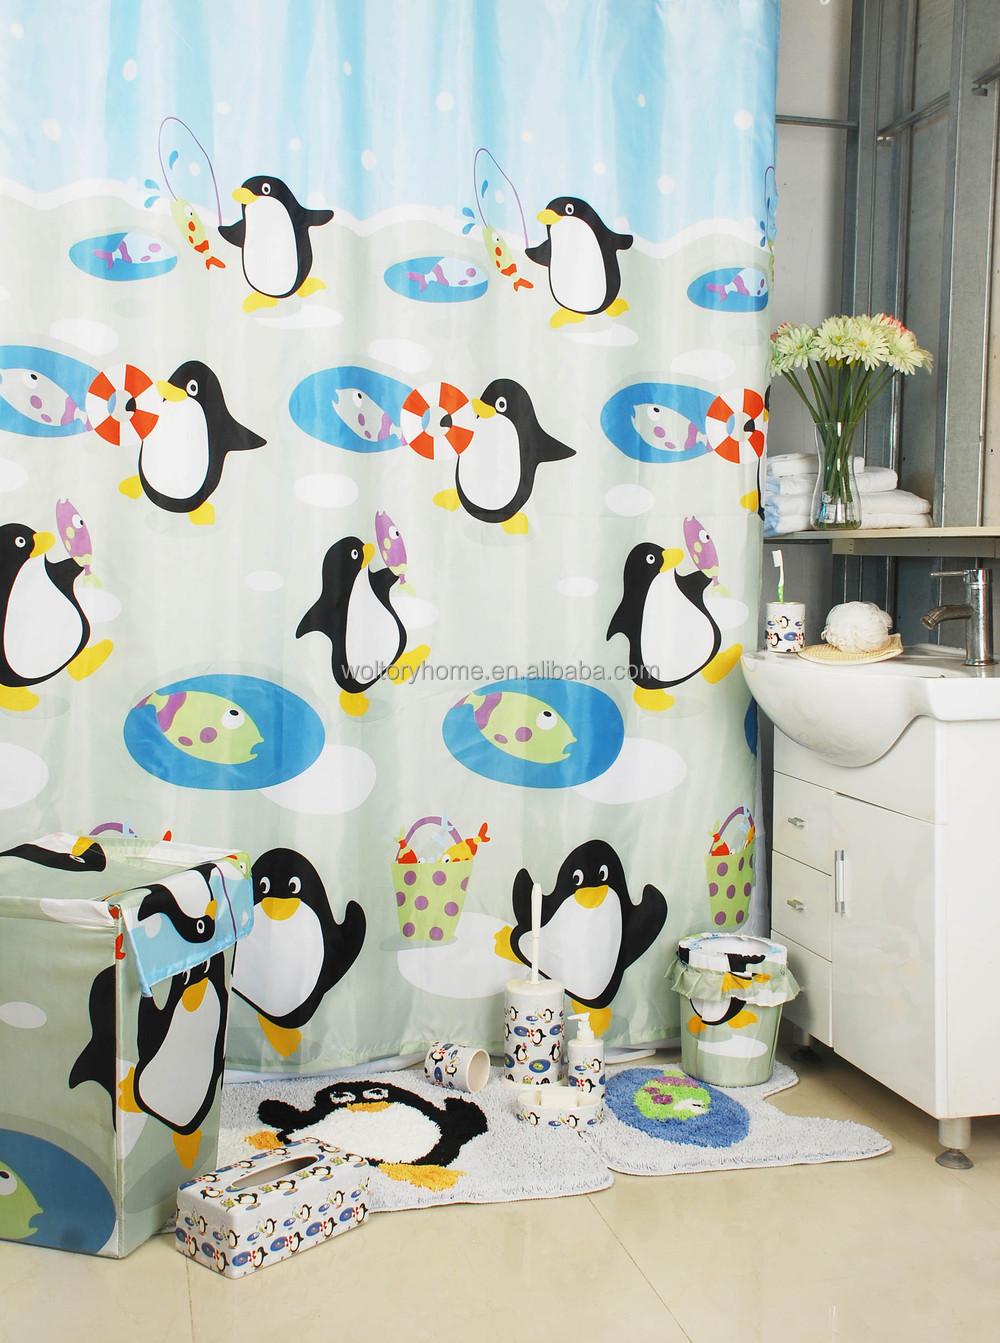 Bath Rug Sets Bathroom Products Bath Set Penguin Bathroom Set Shower